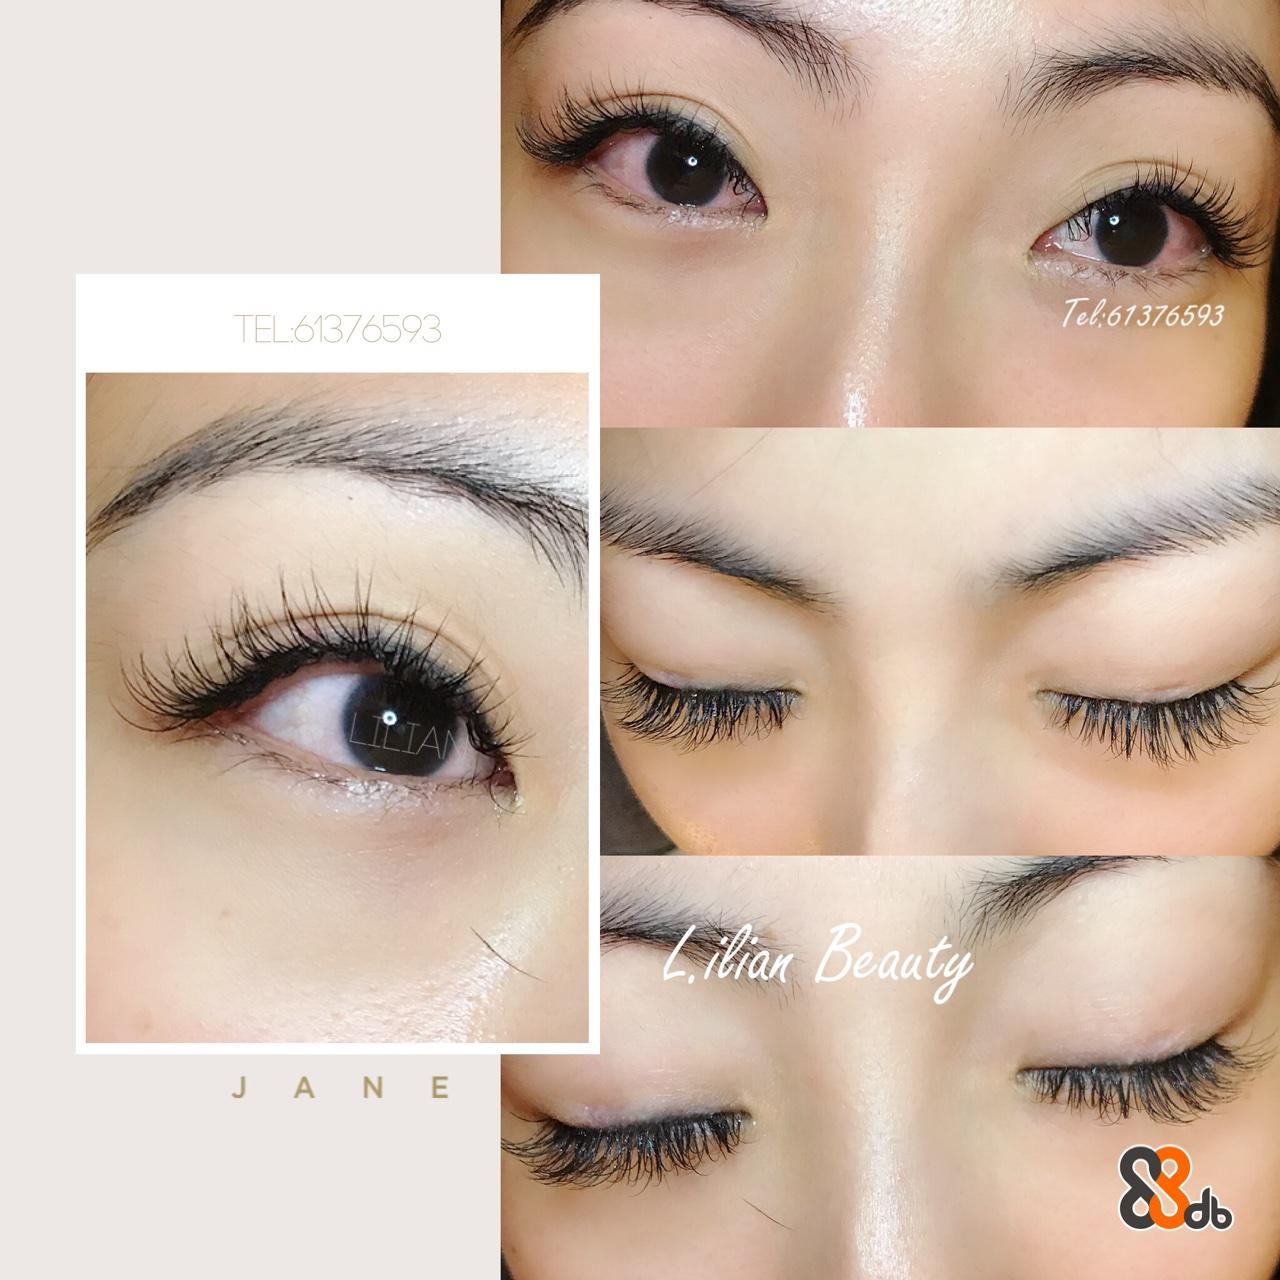 TEL 61376593 Tel61376593 J A NE  eyebrow